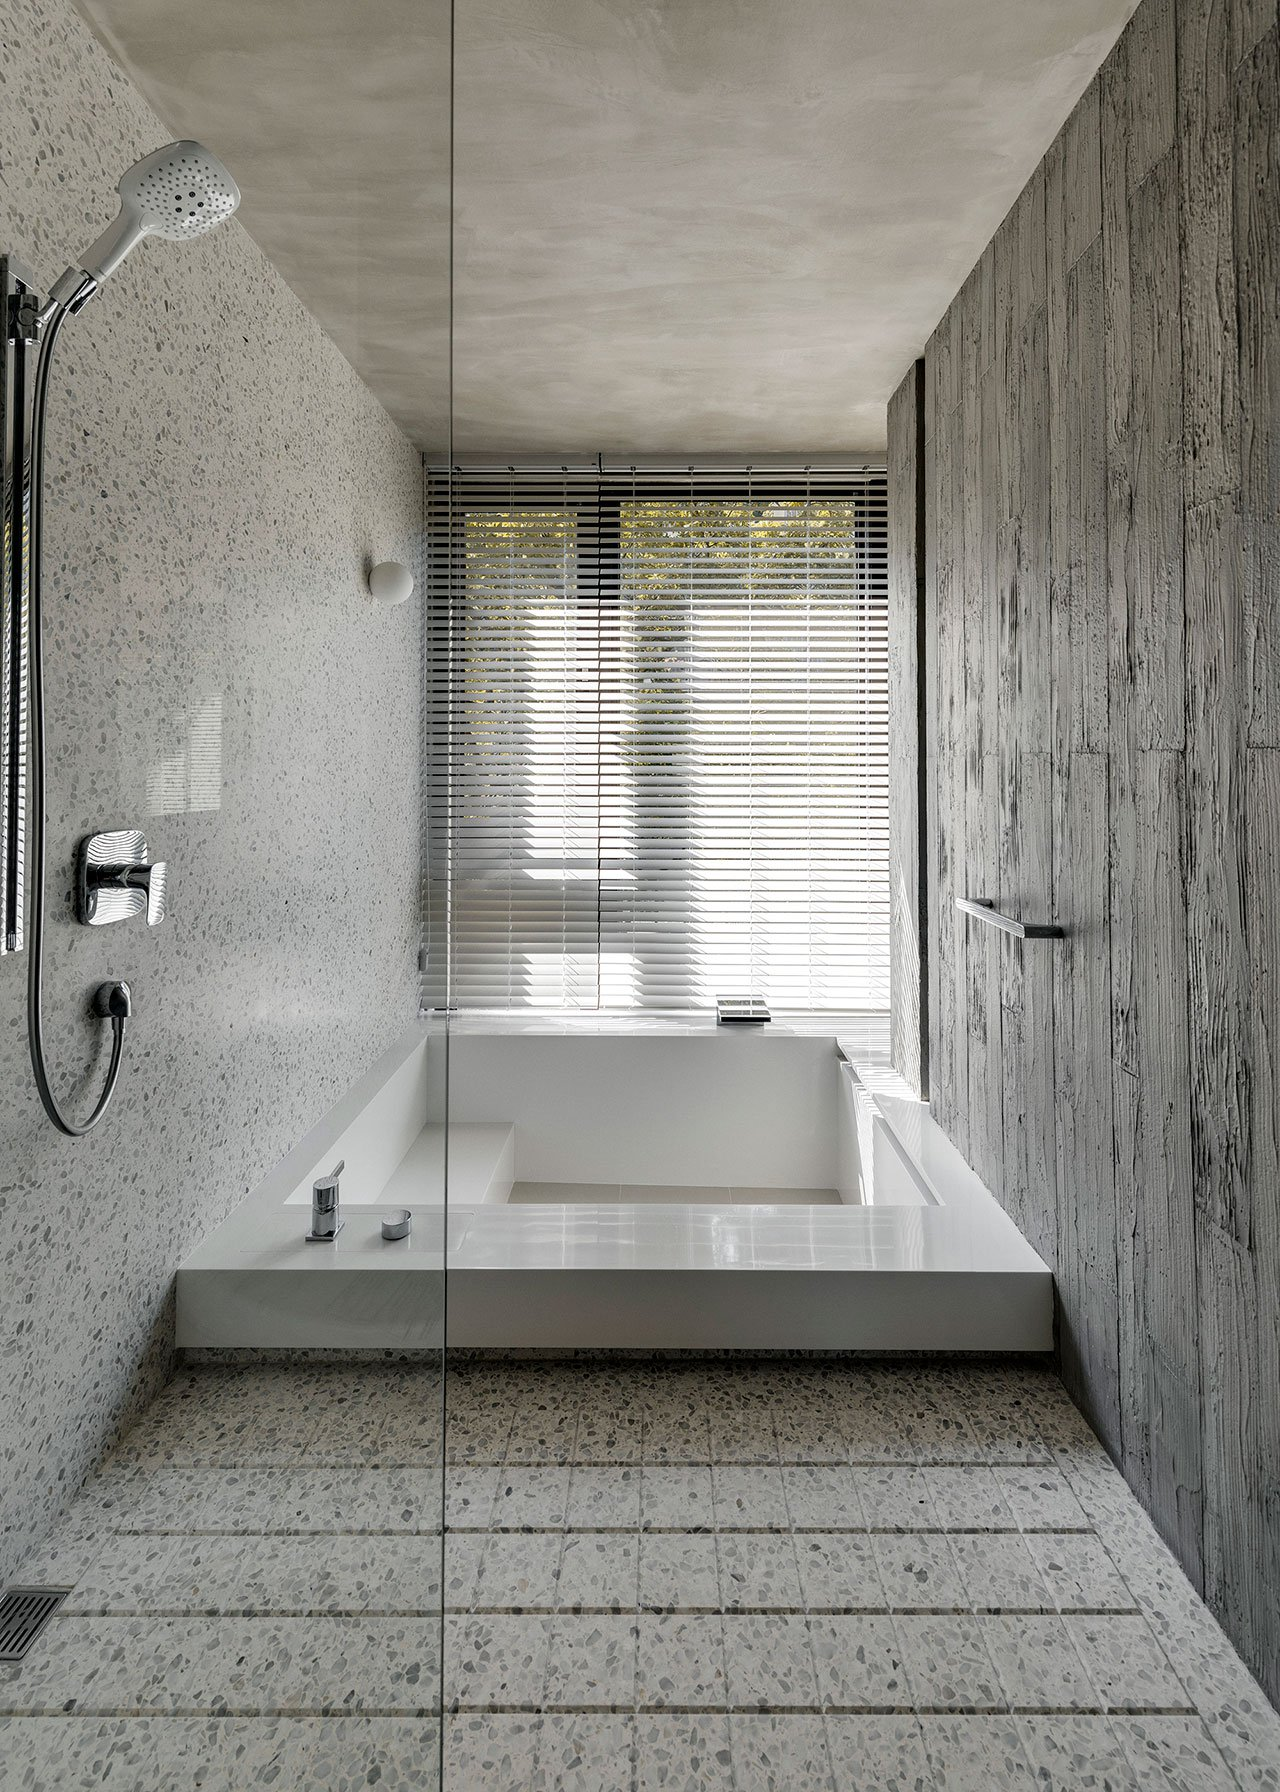 minimalist bathroom design with a sunken bathtub